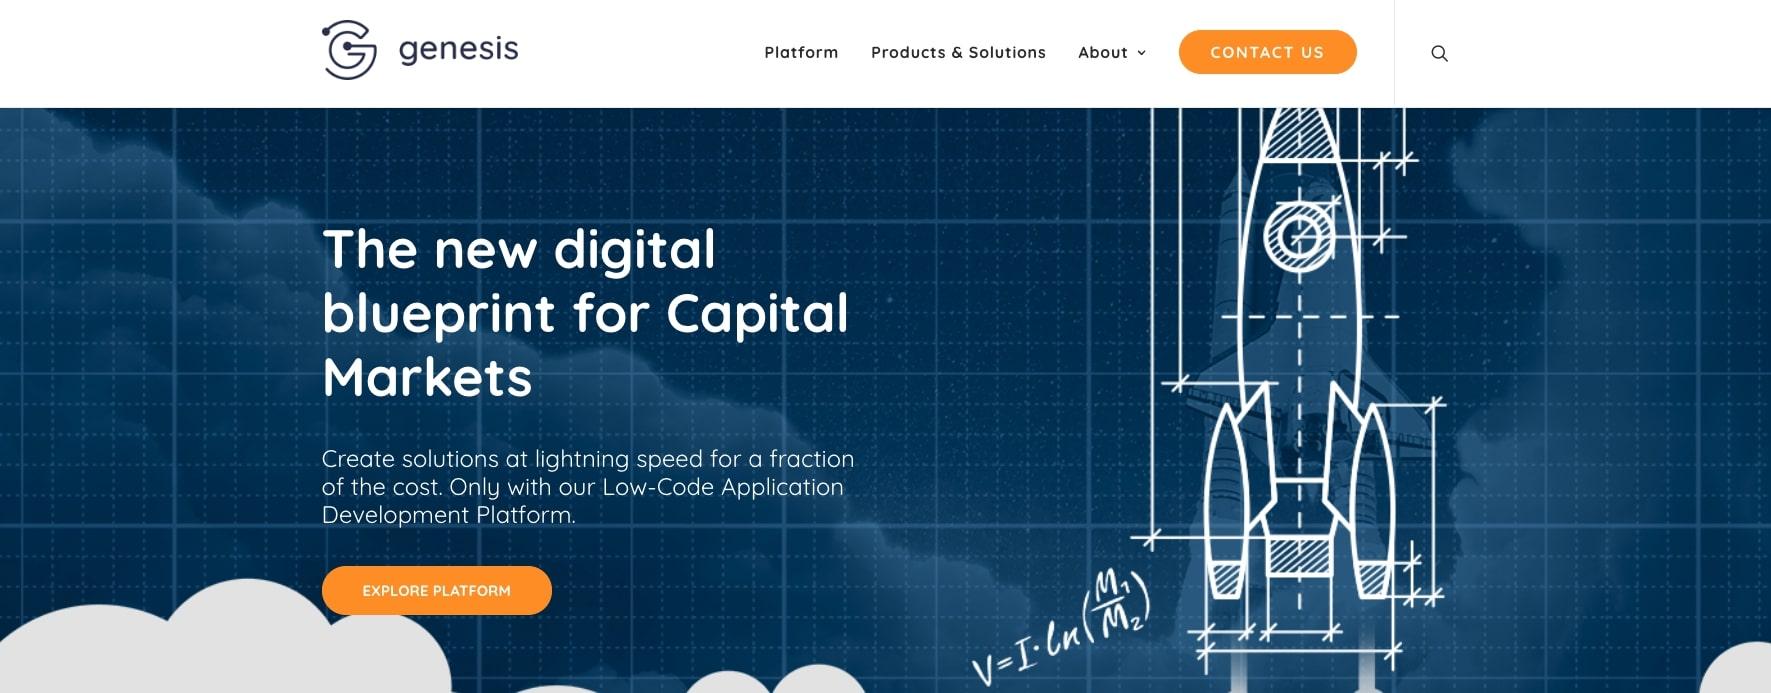 Genesis FinTech Website Homepage